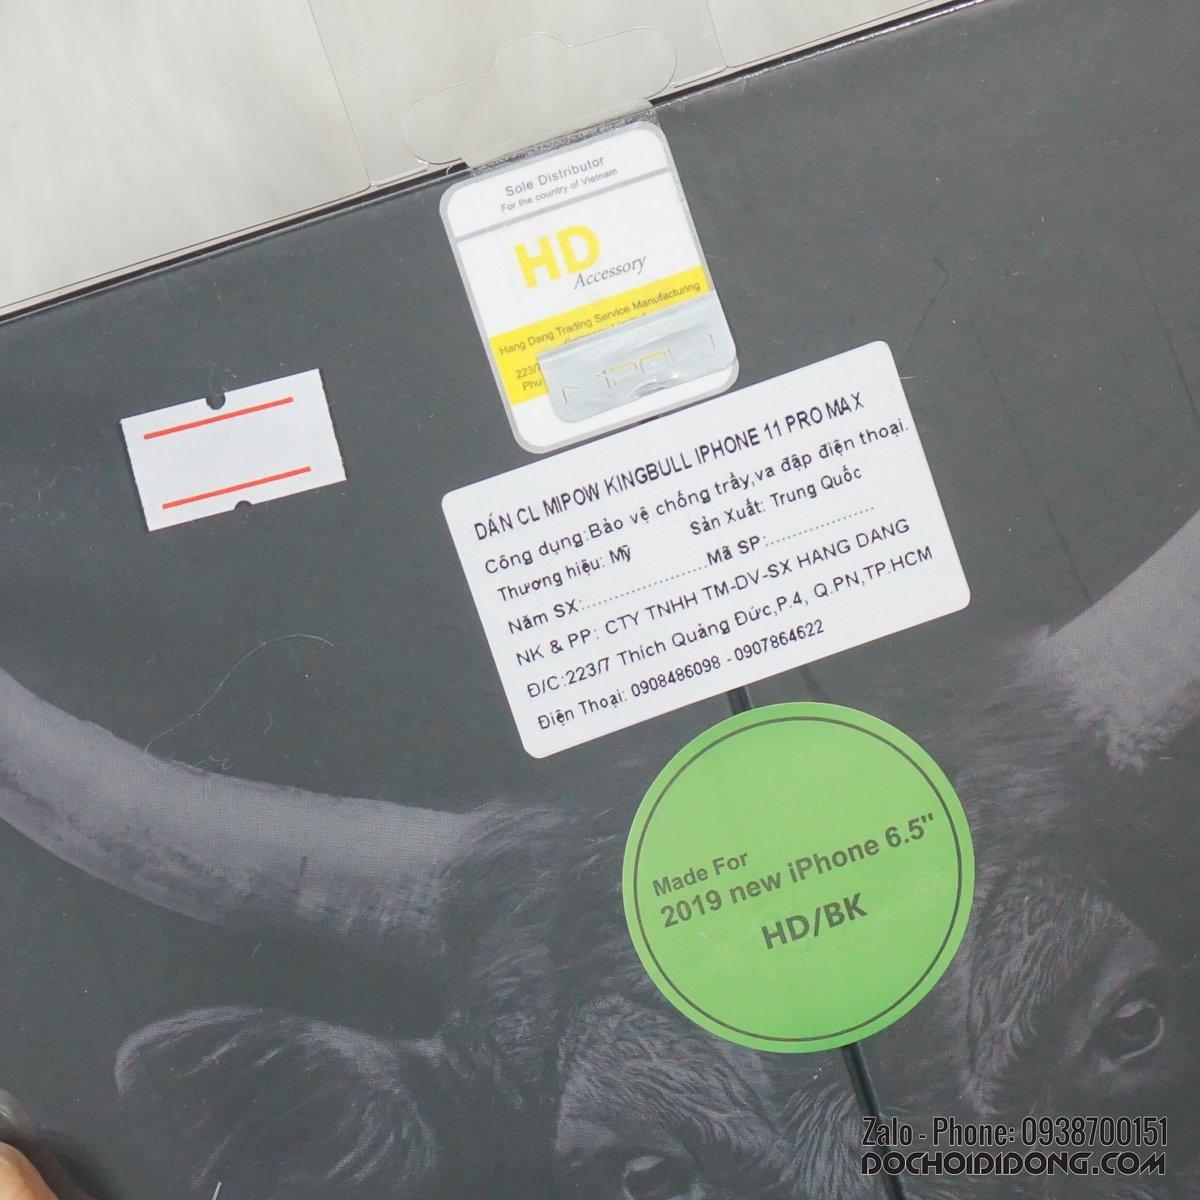 dan-cuong-luc-iphone-11-pro-max-mipow-king-bull-hd-dung-op-chong-soc